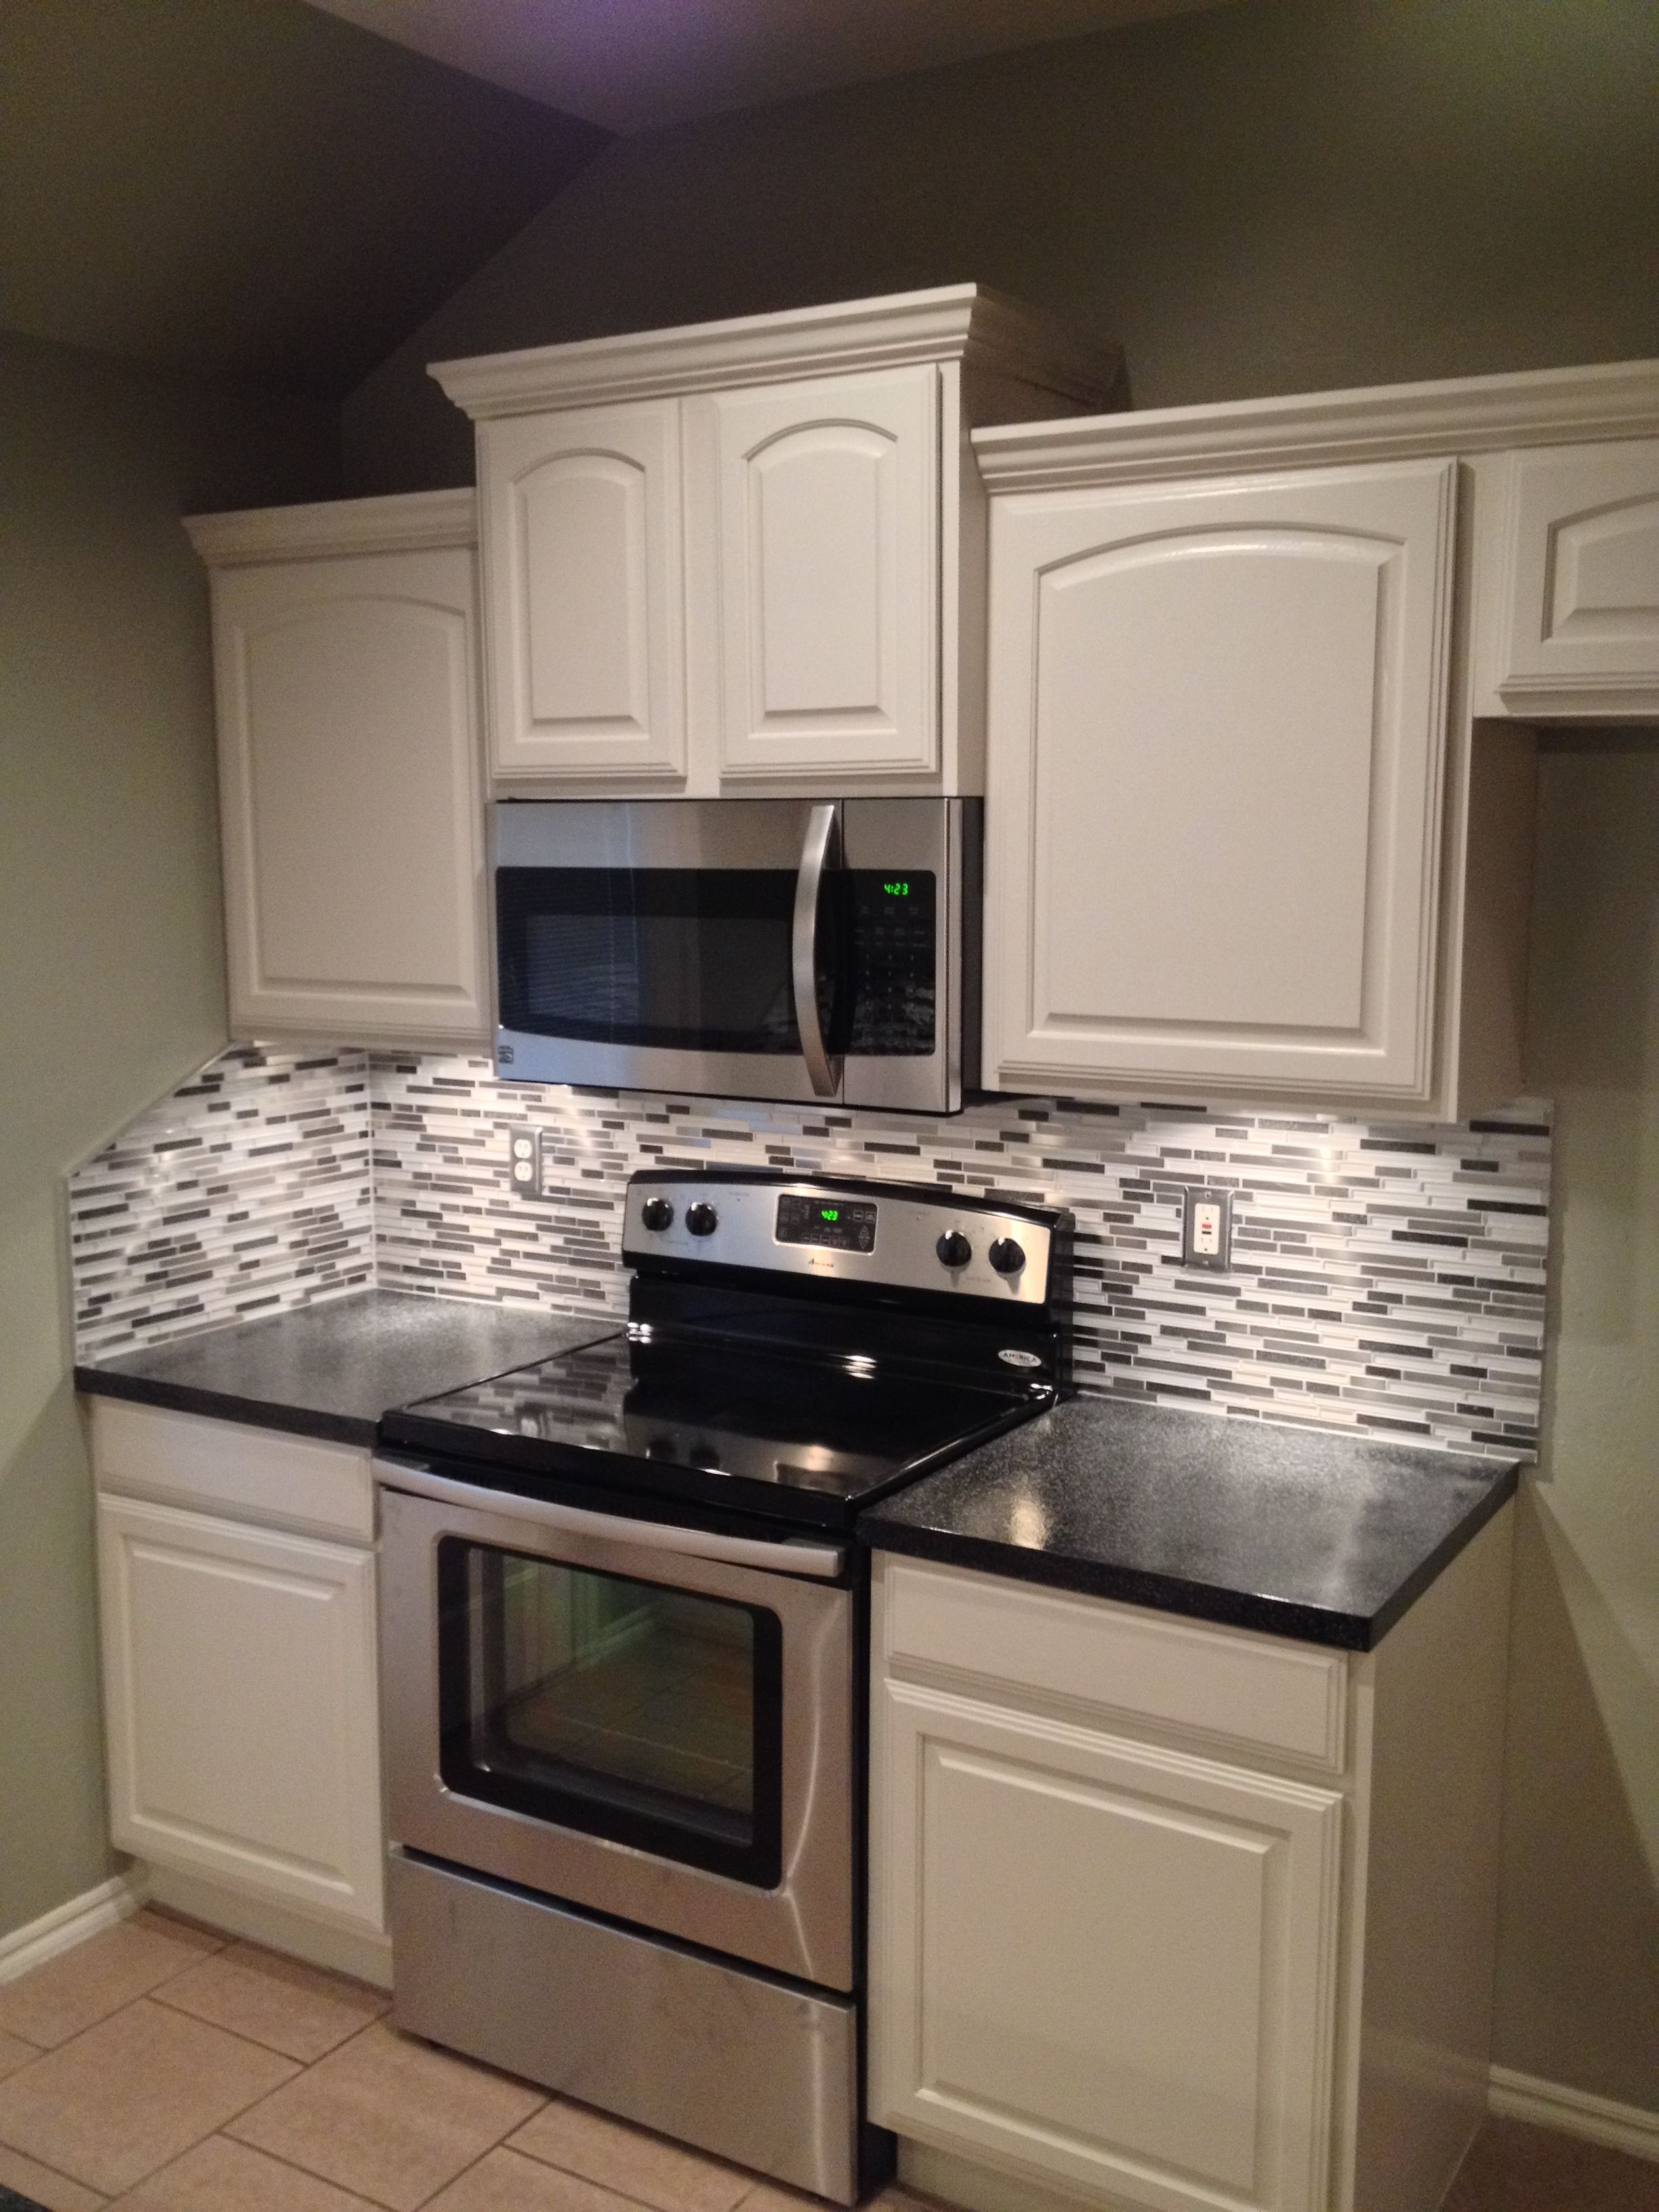 Oklahoma City U0026 Edmond Showers And Backsplash: Painted Kitchen Cabinets,  New Counter Tops,